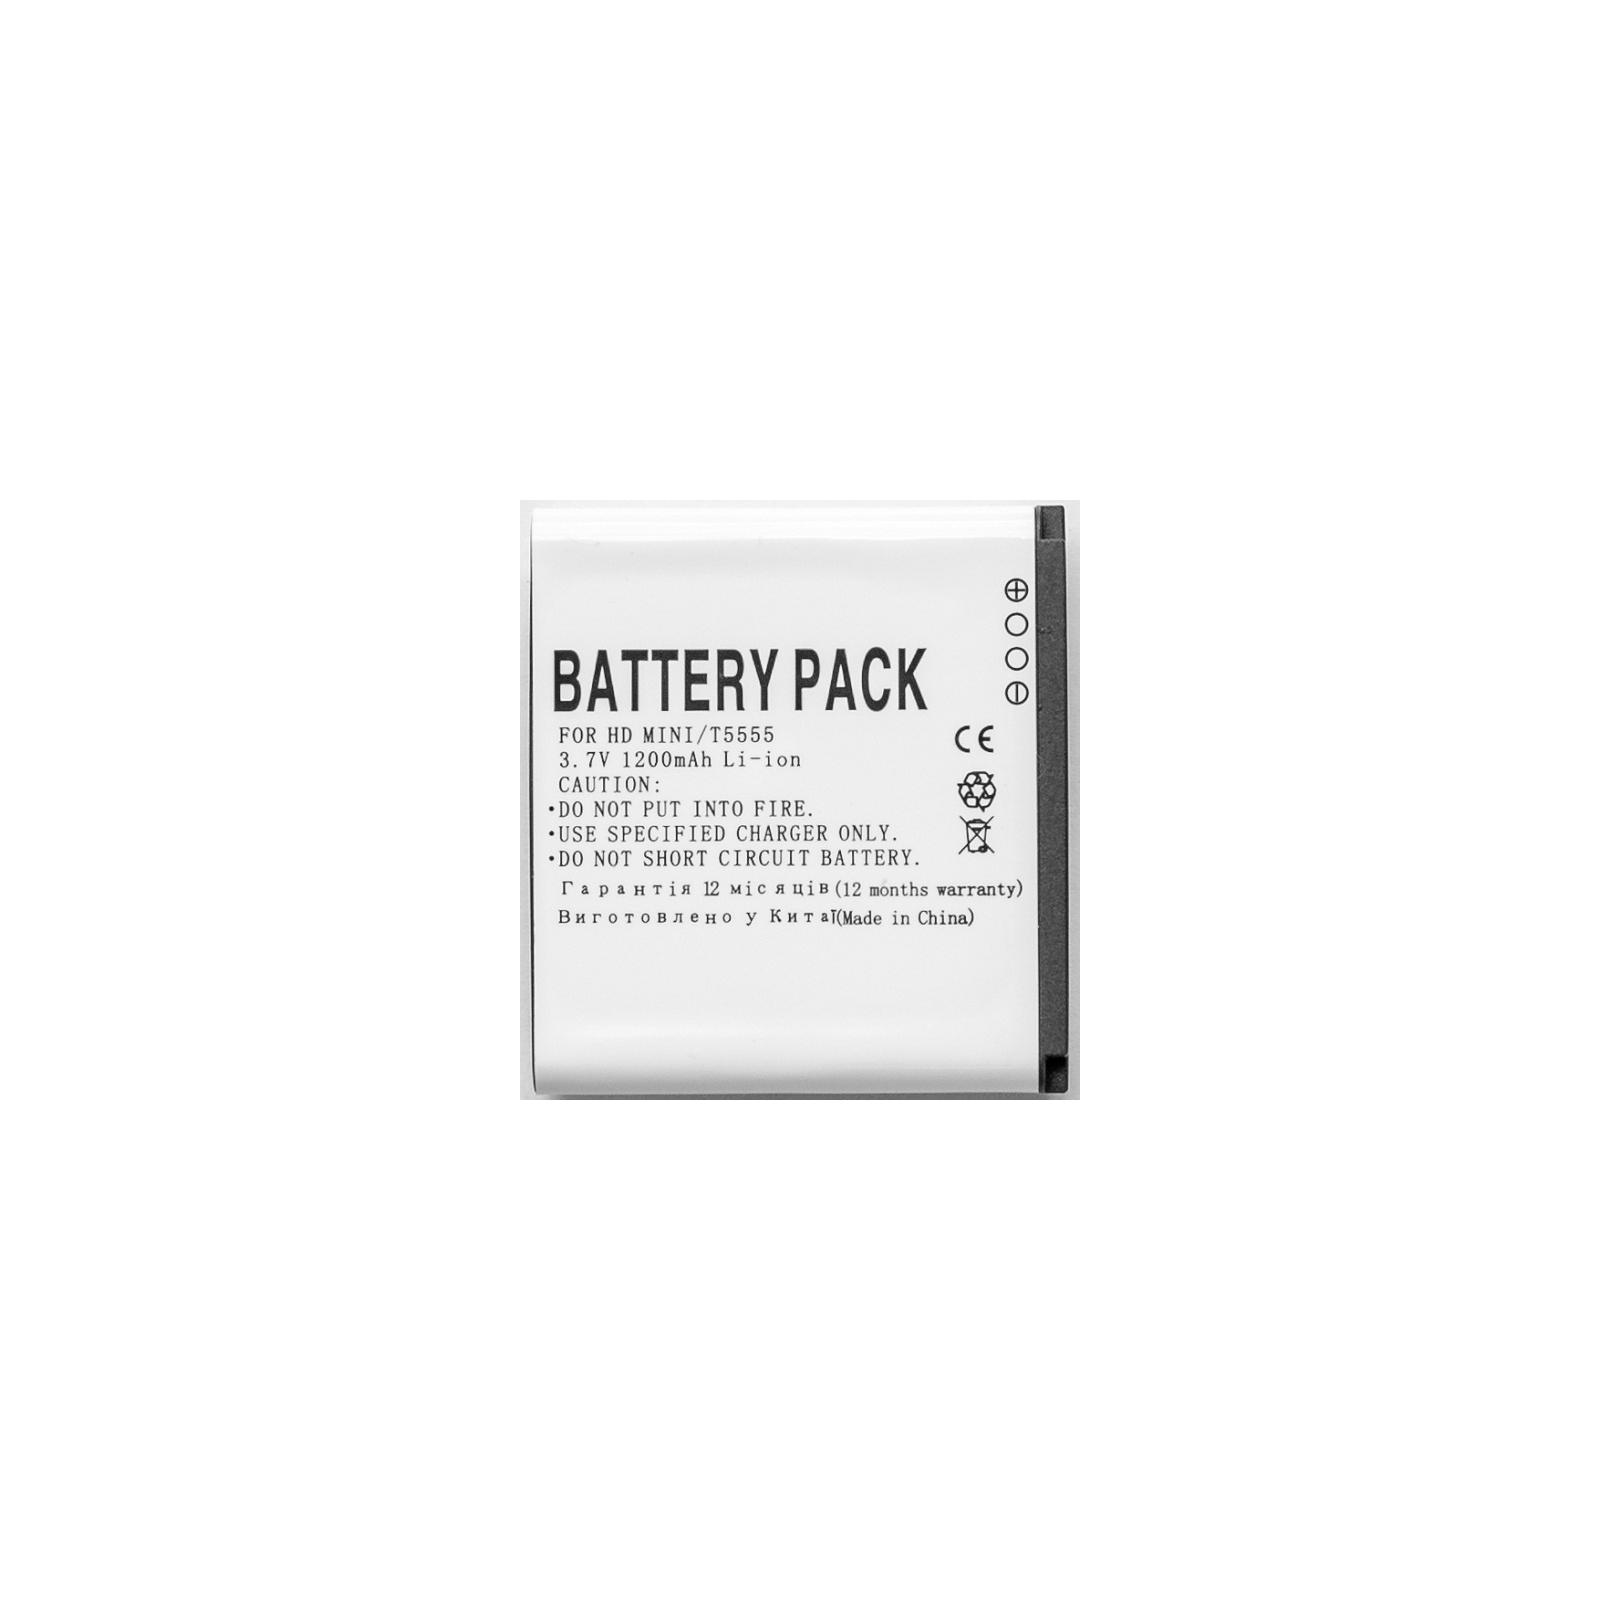 Аккумуляторная батарея PowerPlant HTC HD Mini, T5555 (BAS430) (DV00DV6086) изображение 2